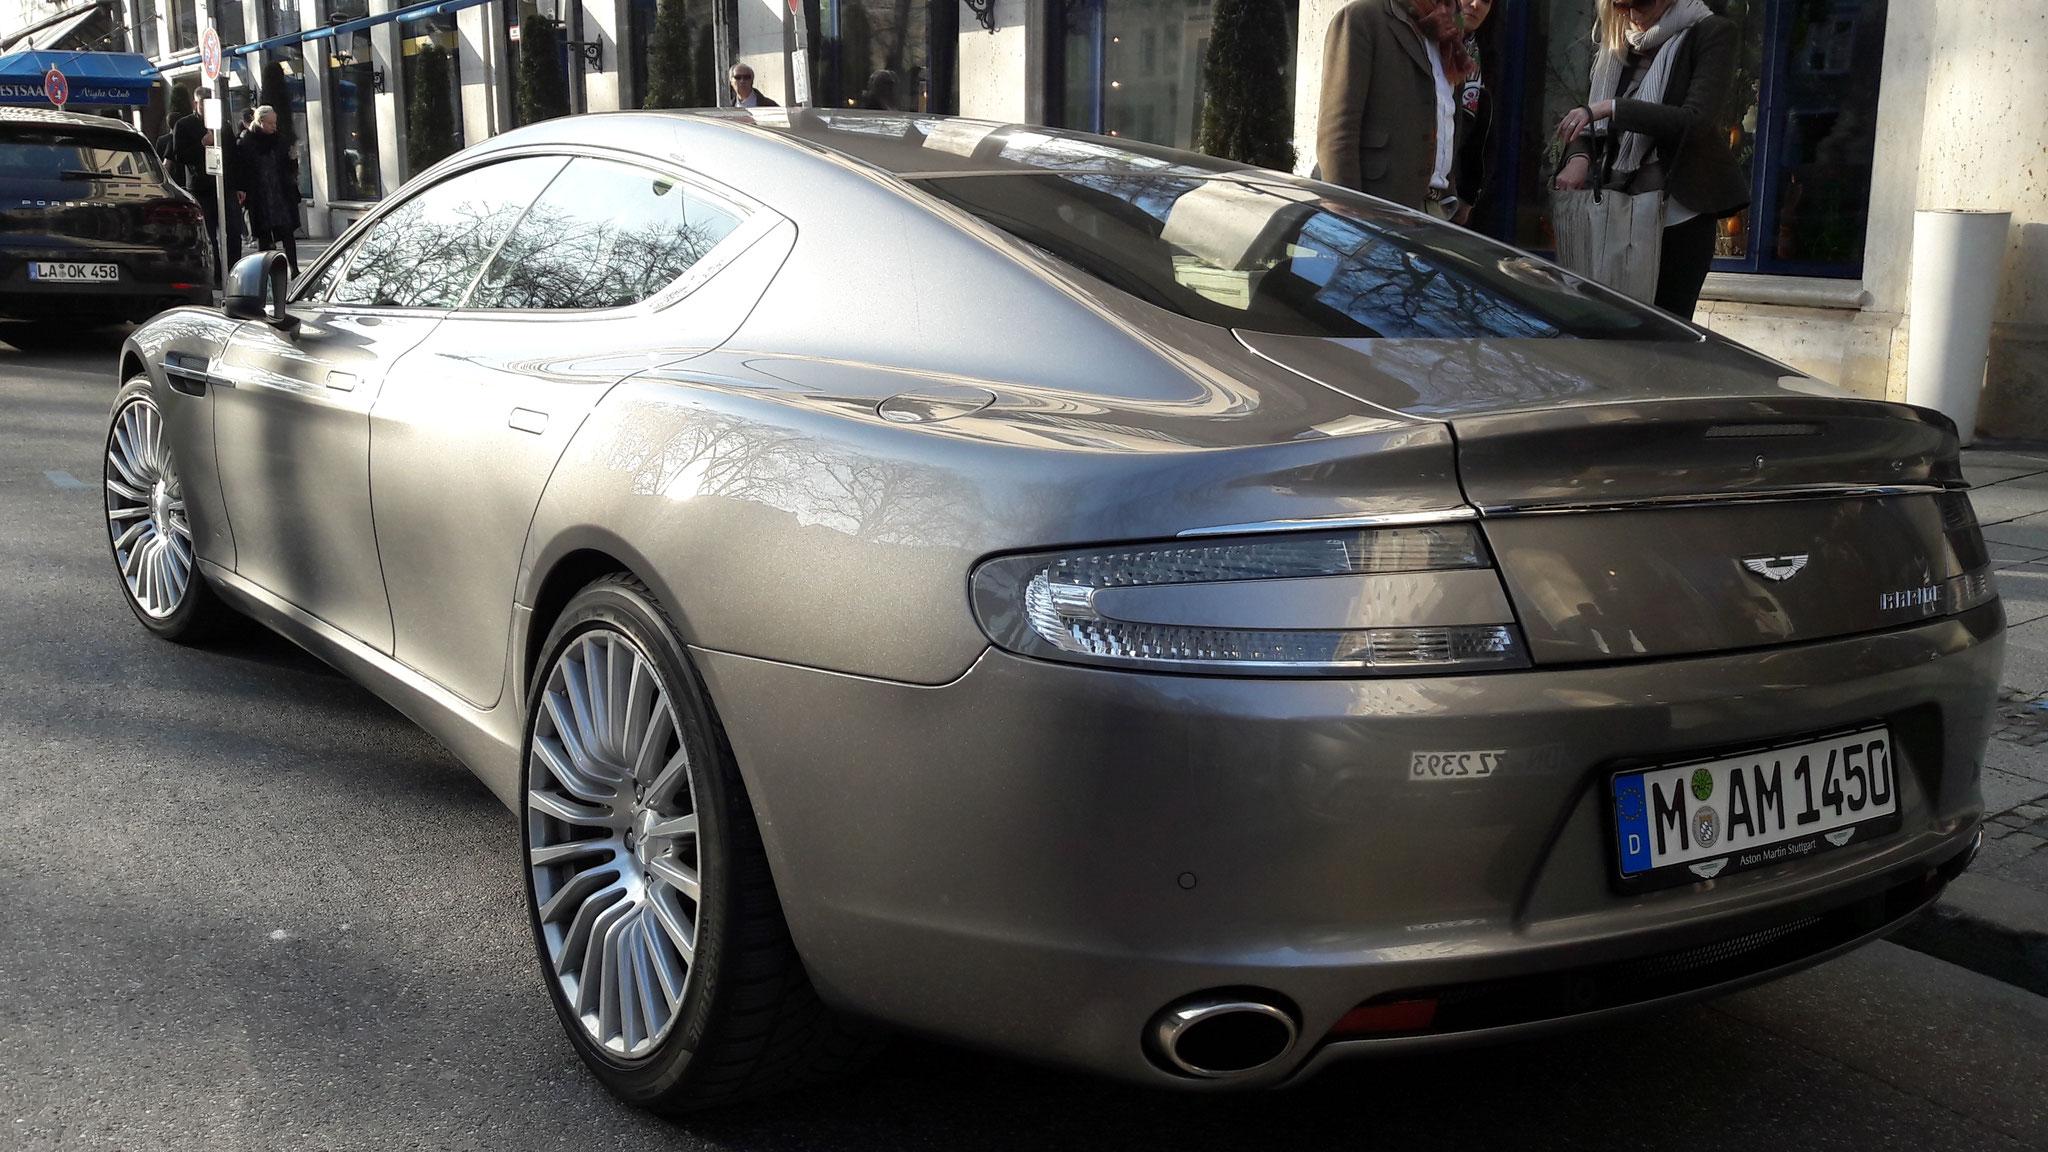 Aston Martin Rapide - M-AM-1450